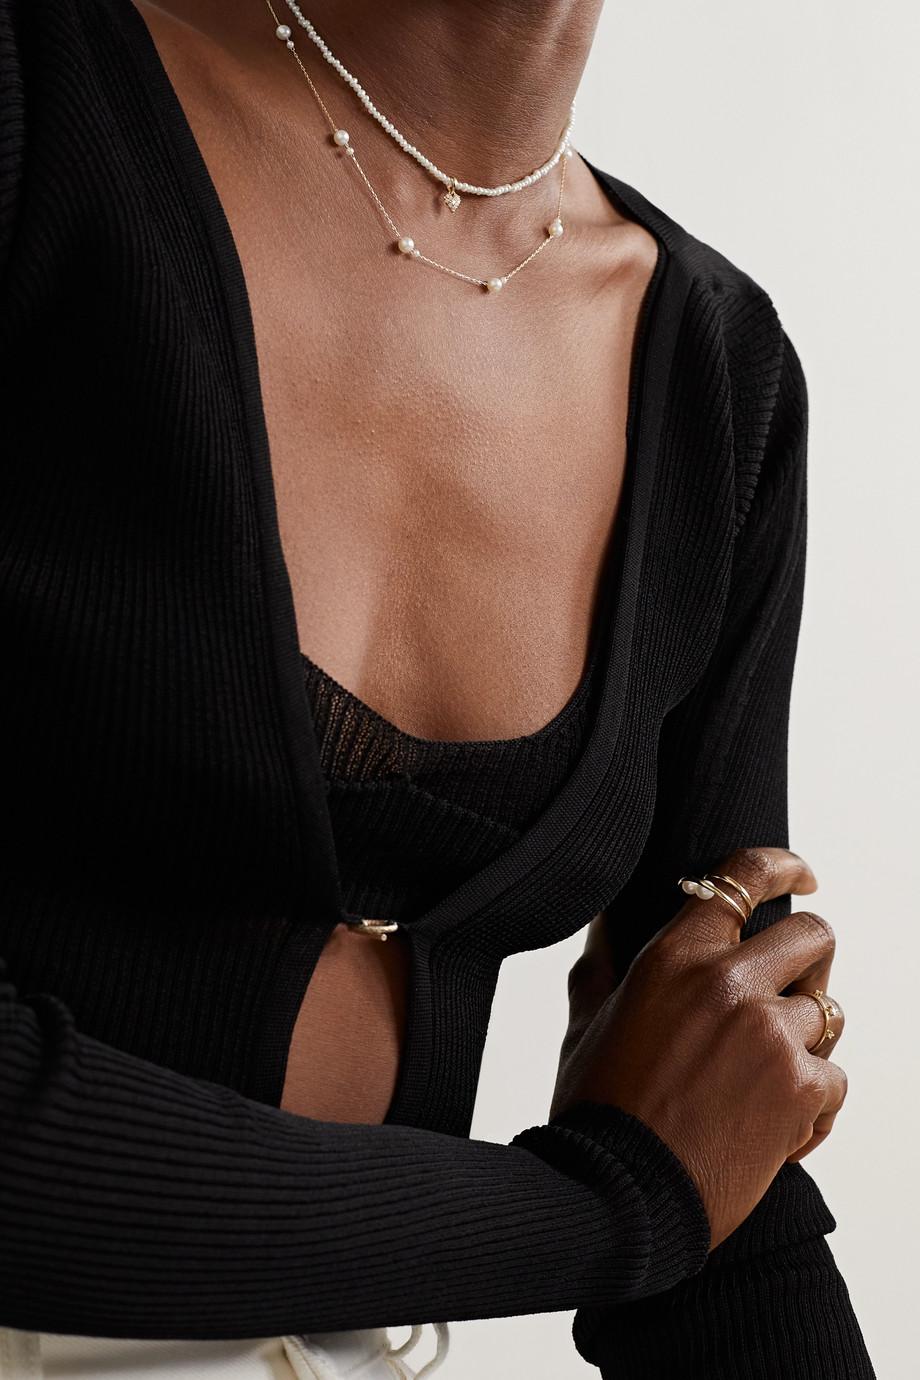 Mizuki Collier en or 14 carats, perles et diamants